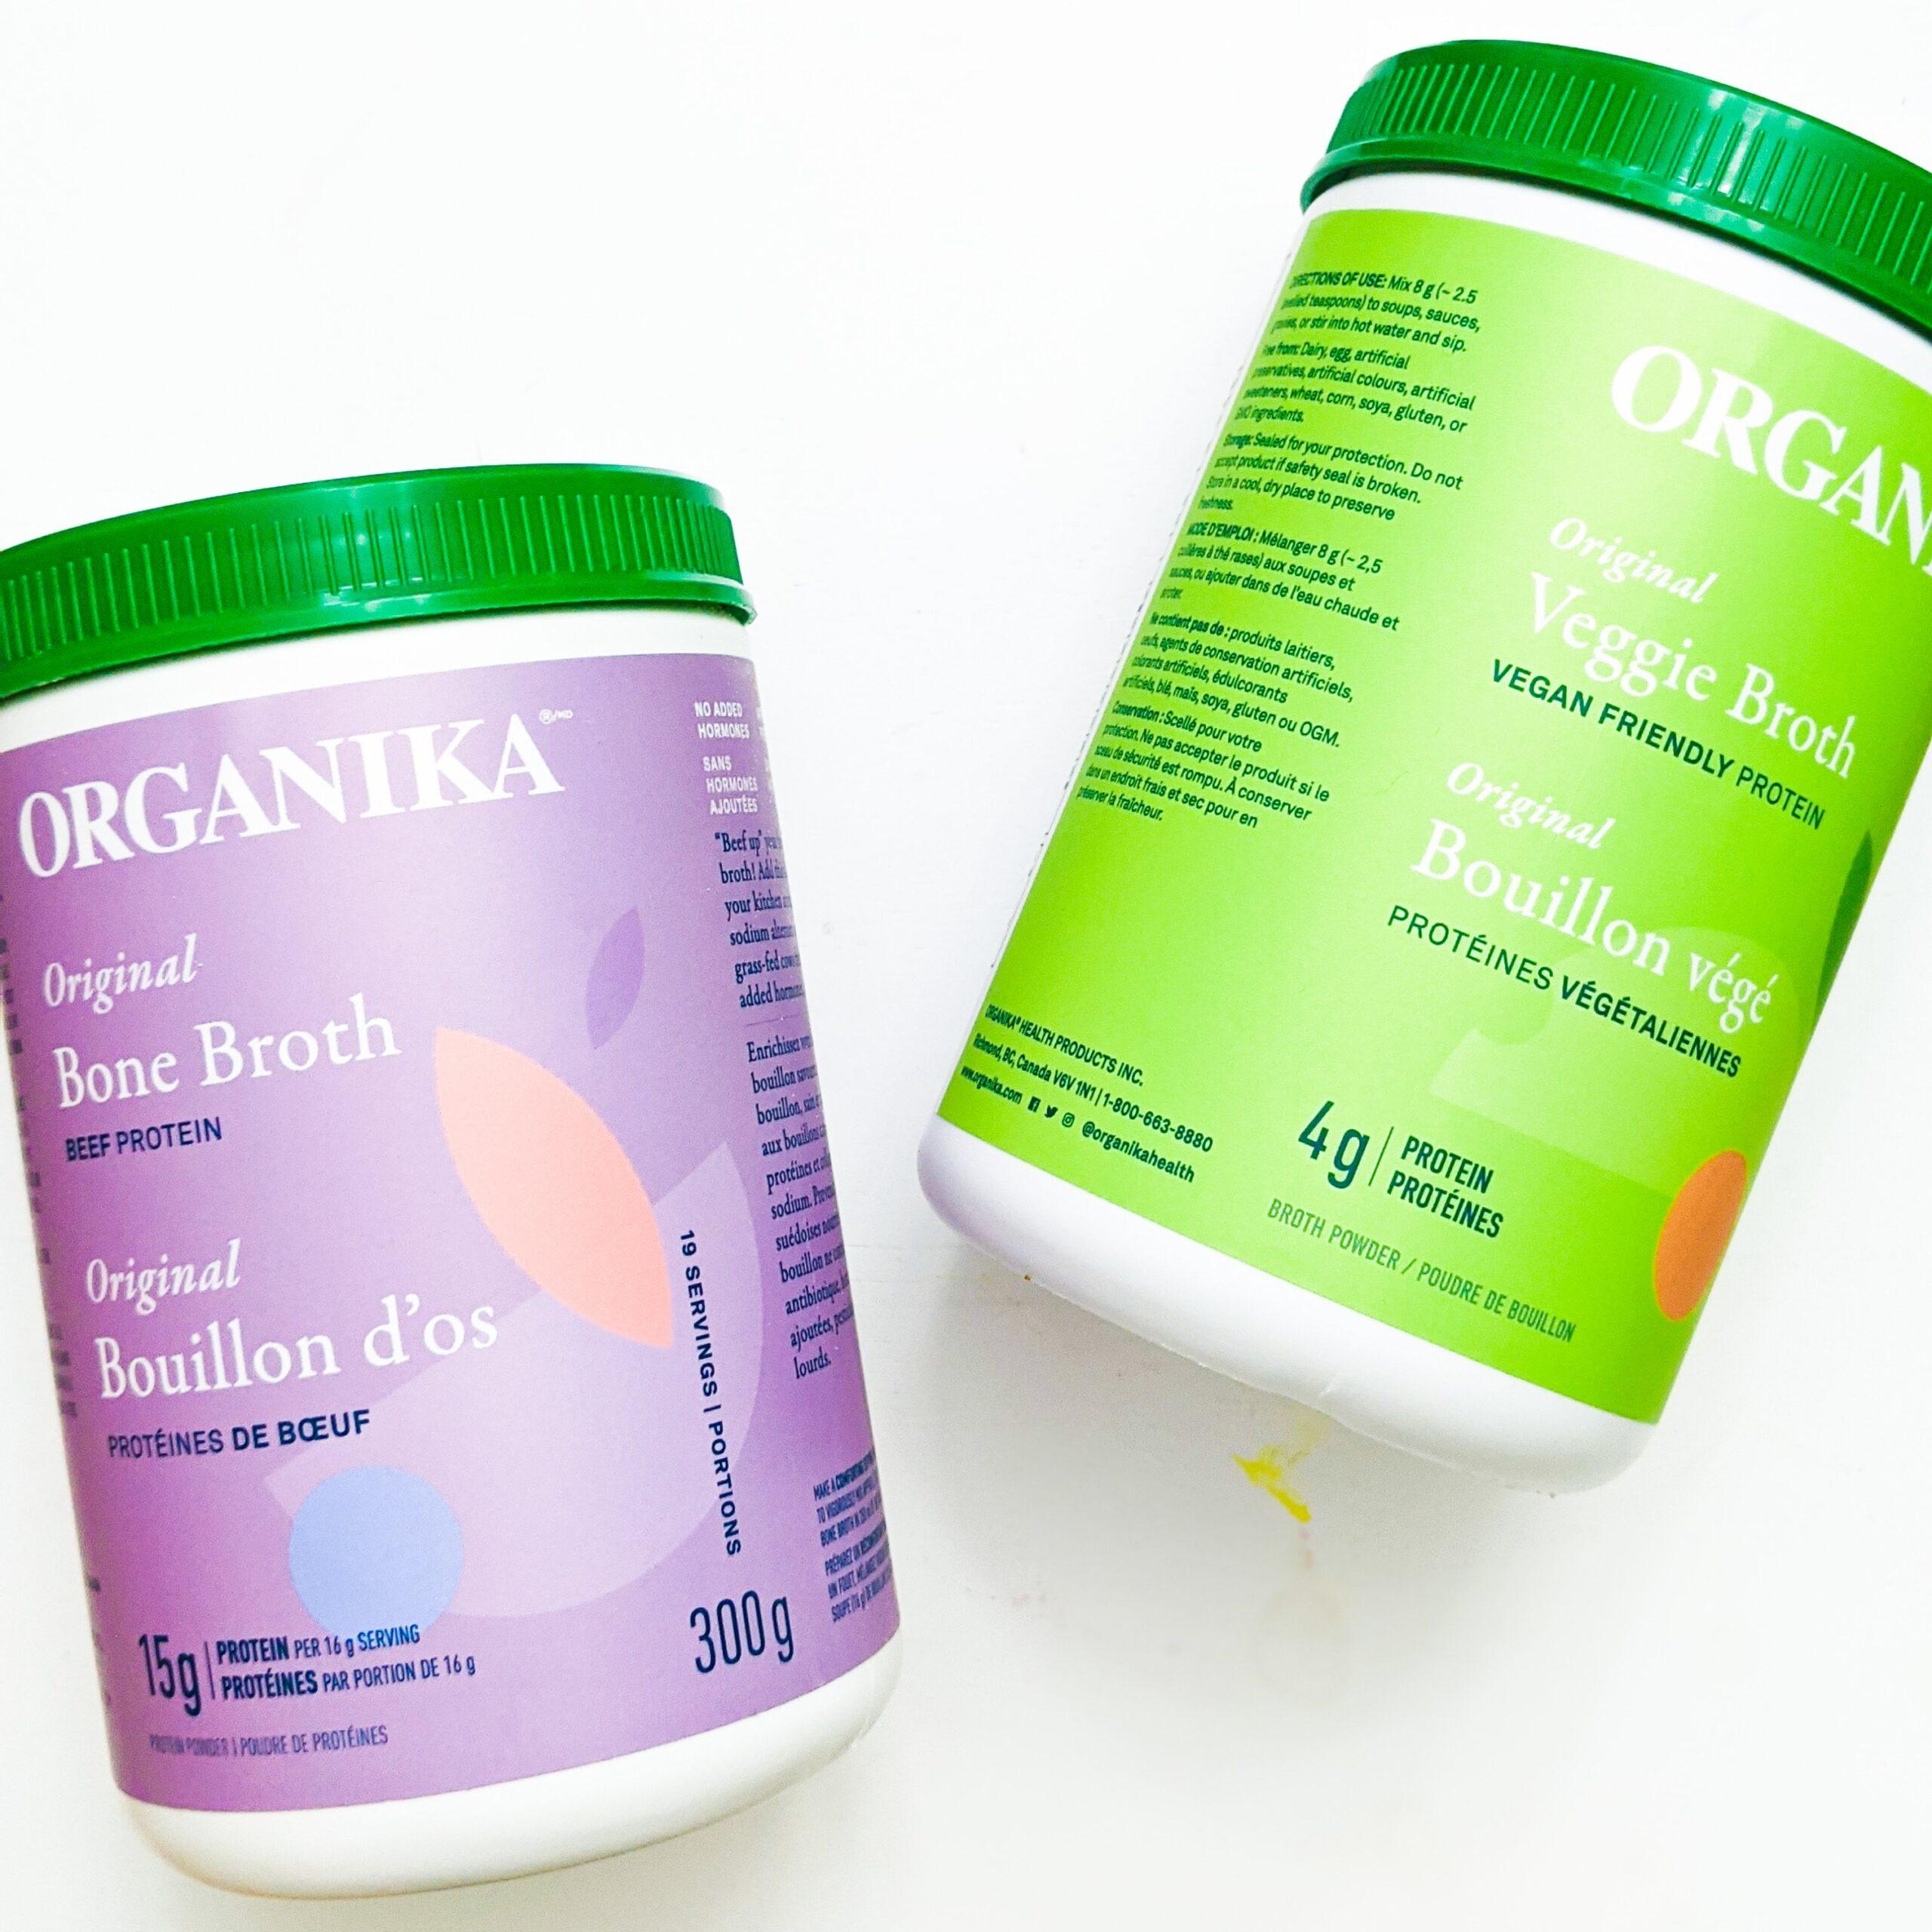 organika bone broth